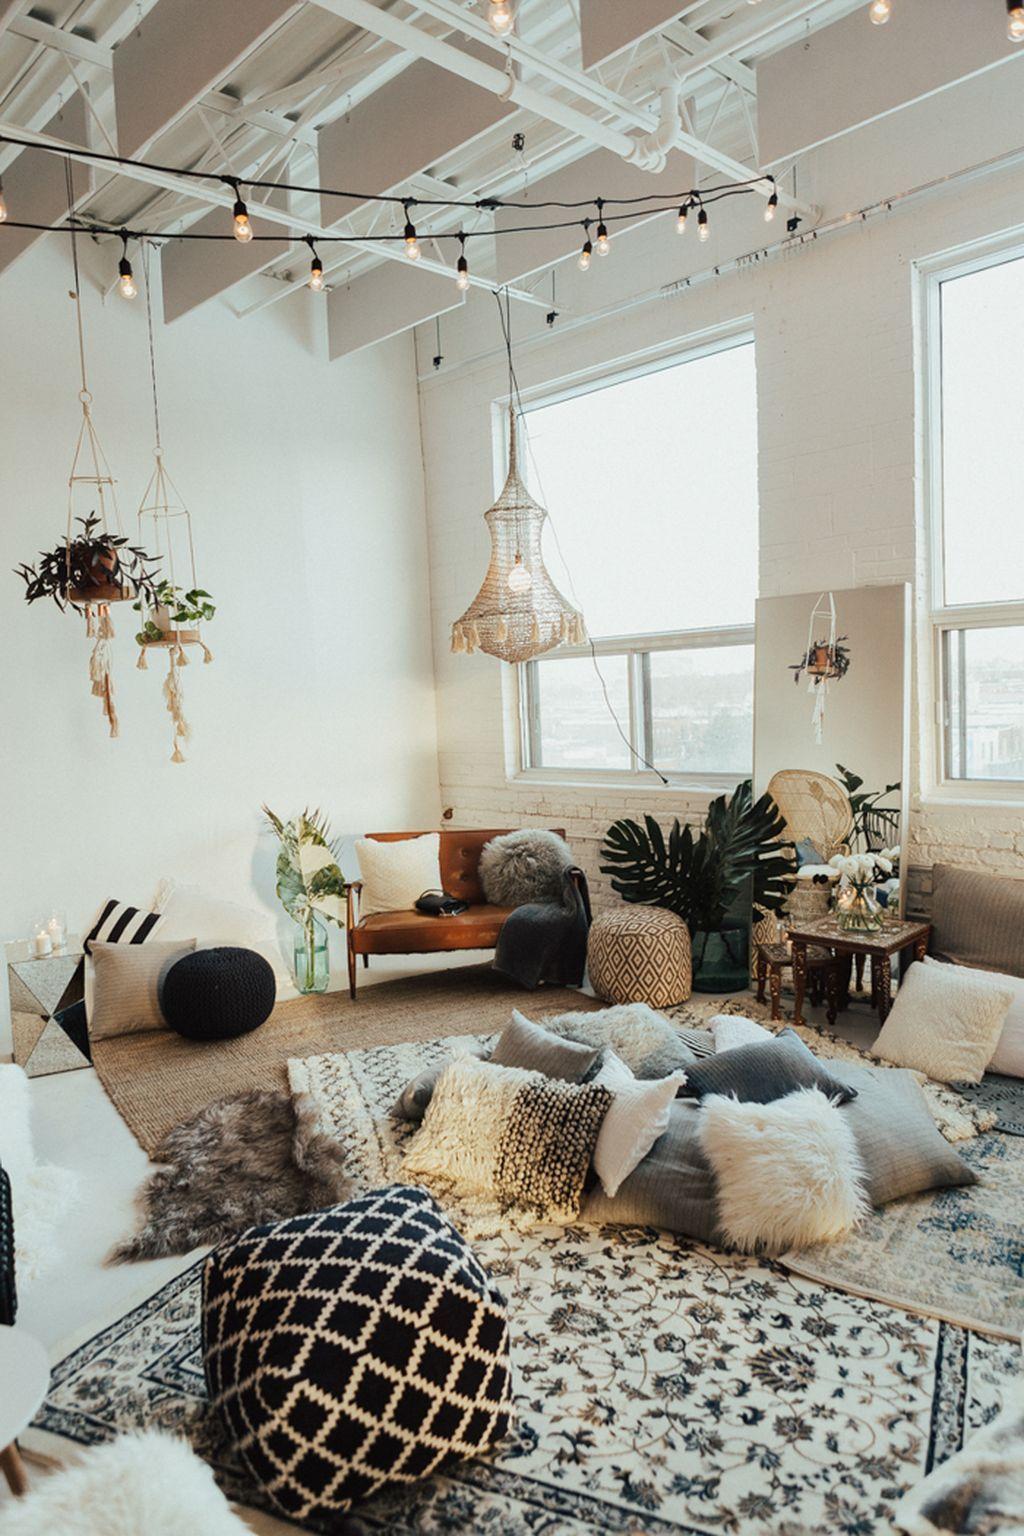 99 Modern Rustic Bohemian Living Room Design Ideas | Bohemian ...